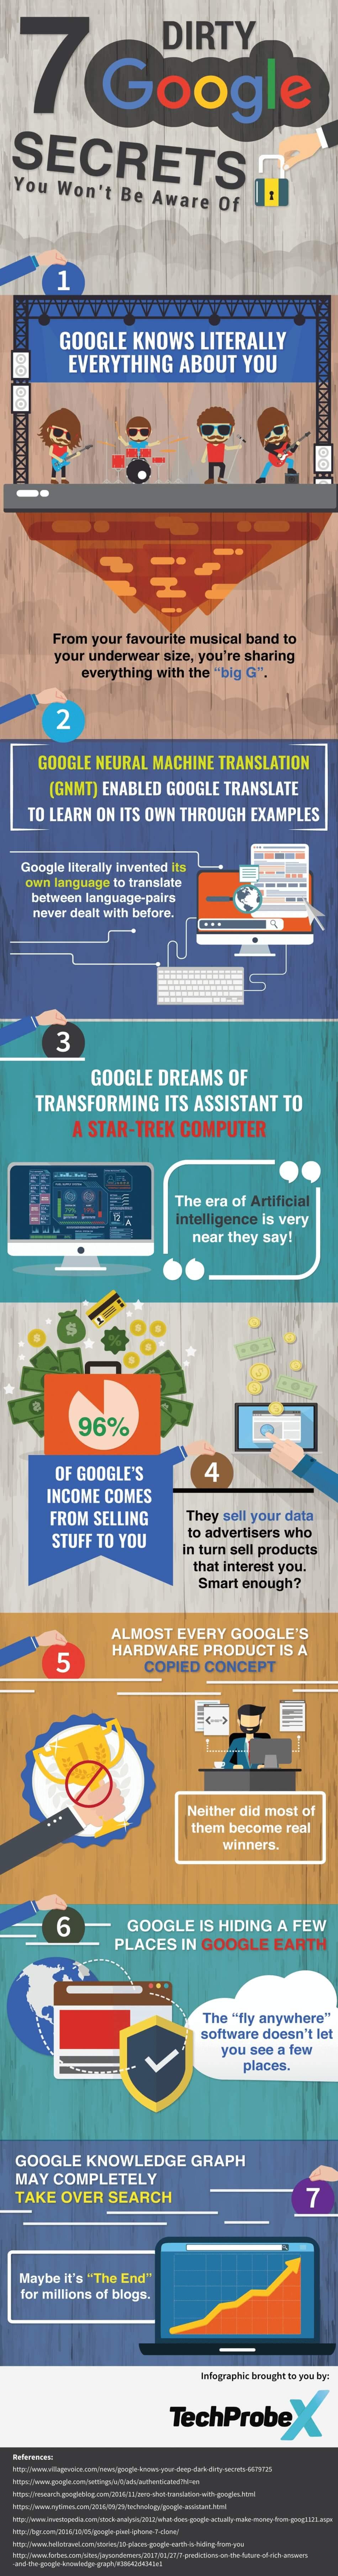 Google-Secrets-Infographic